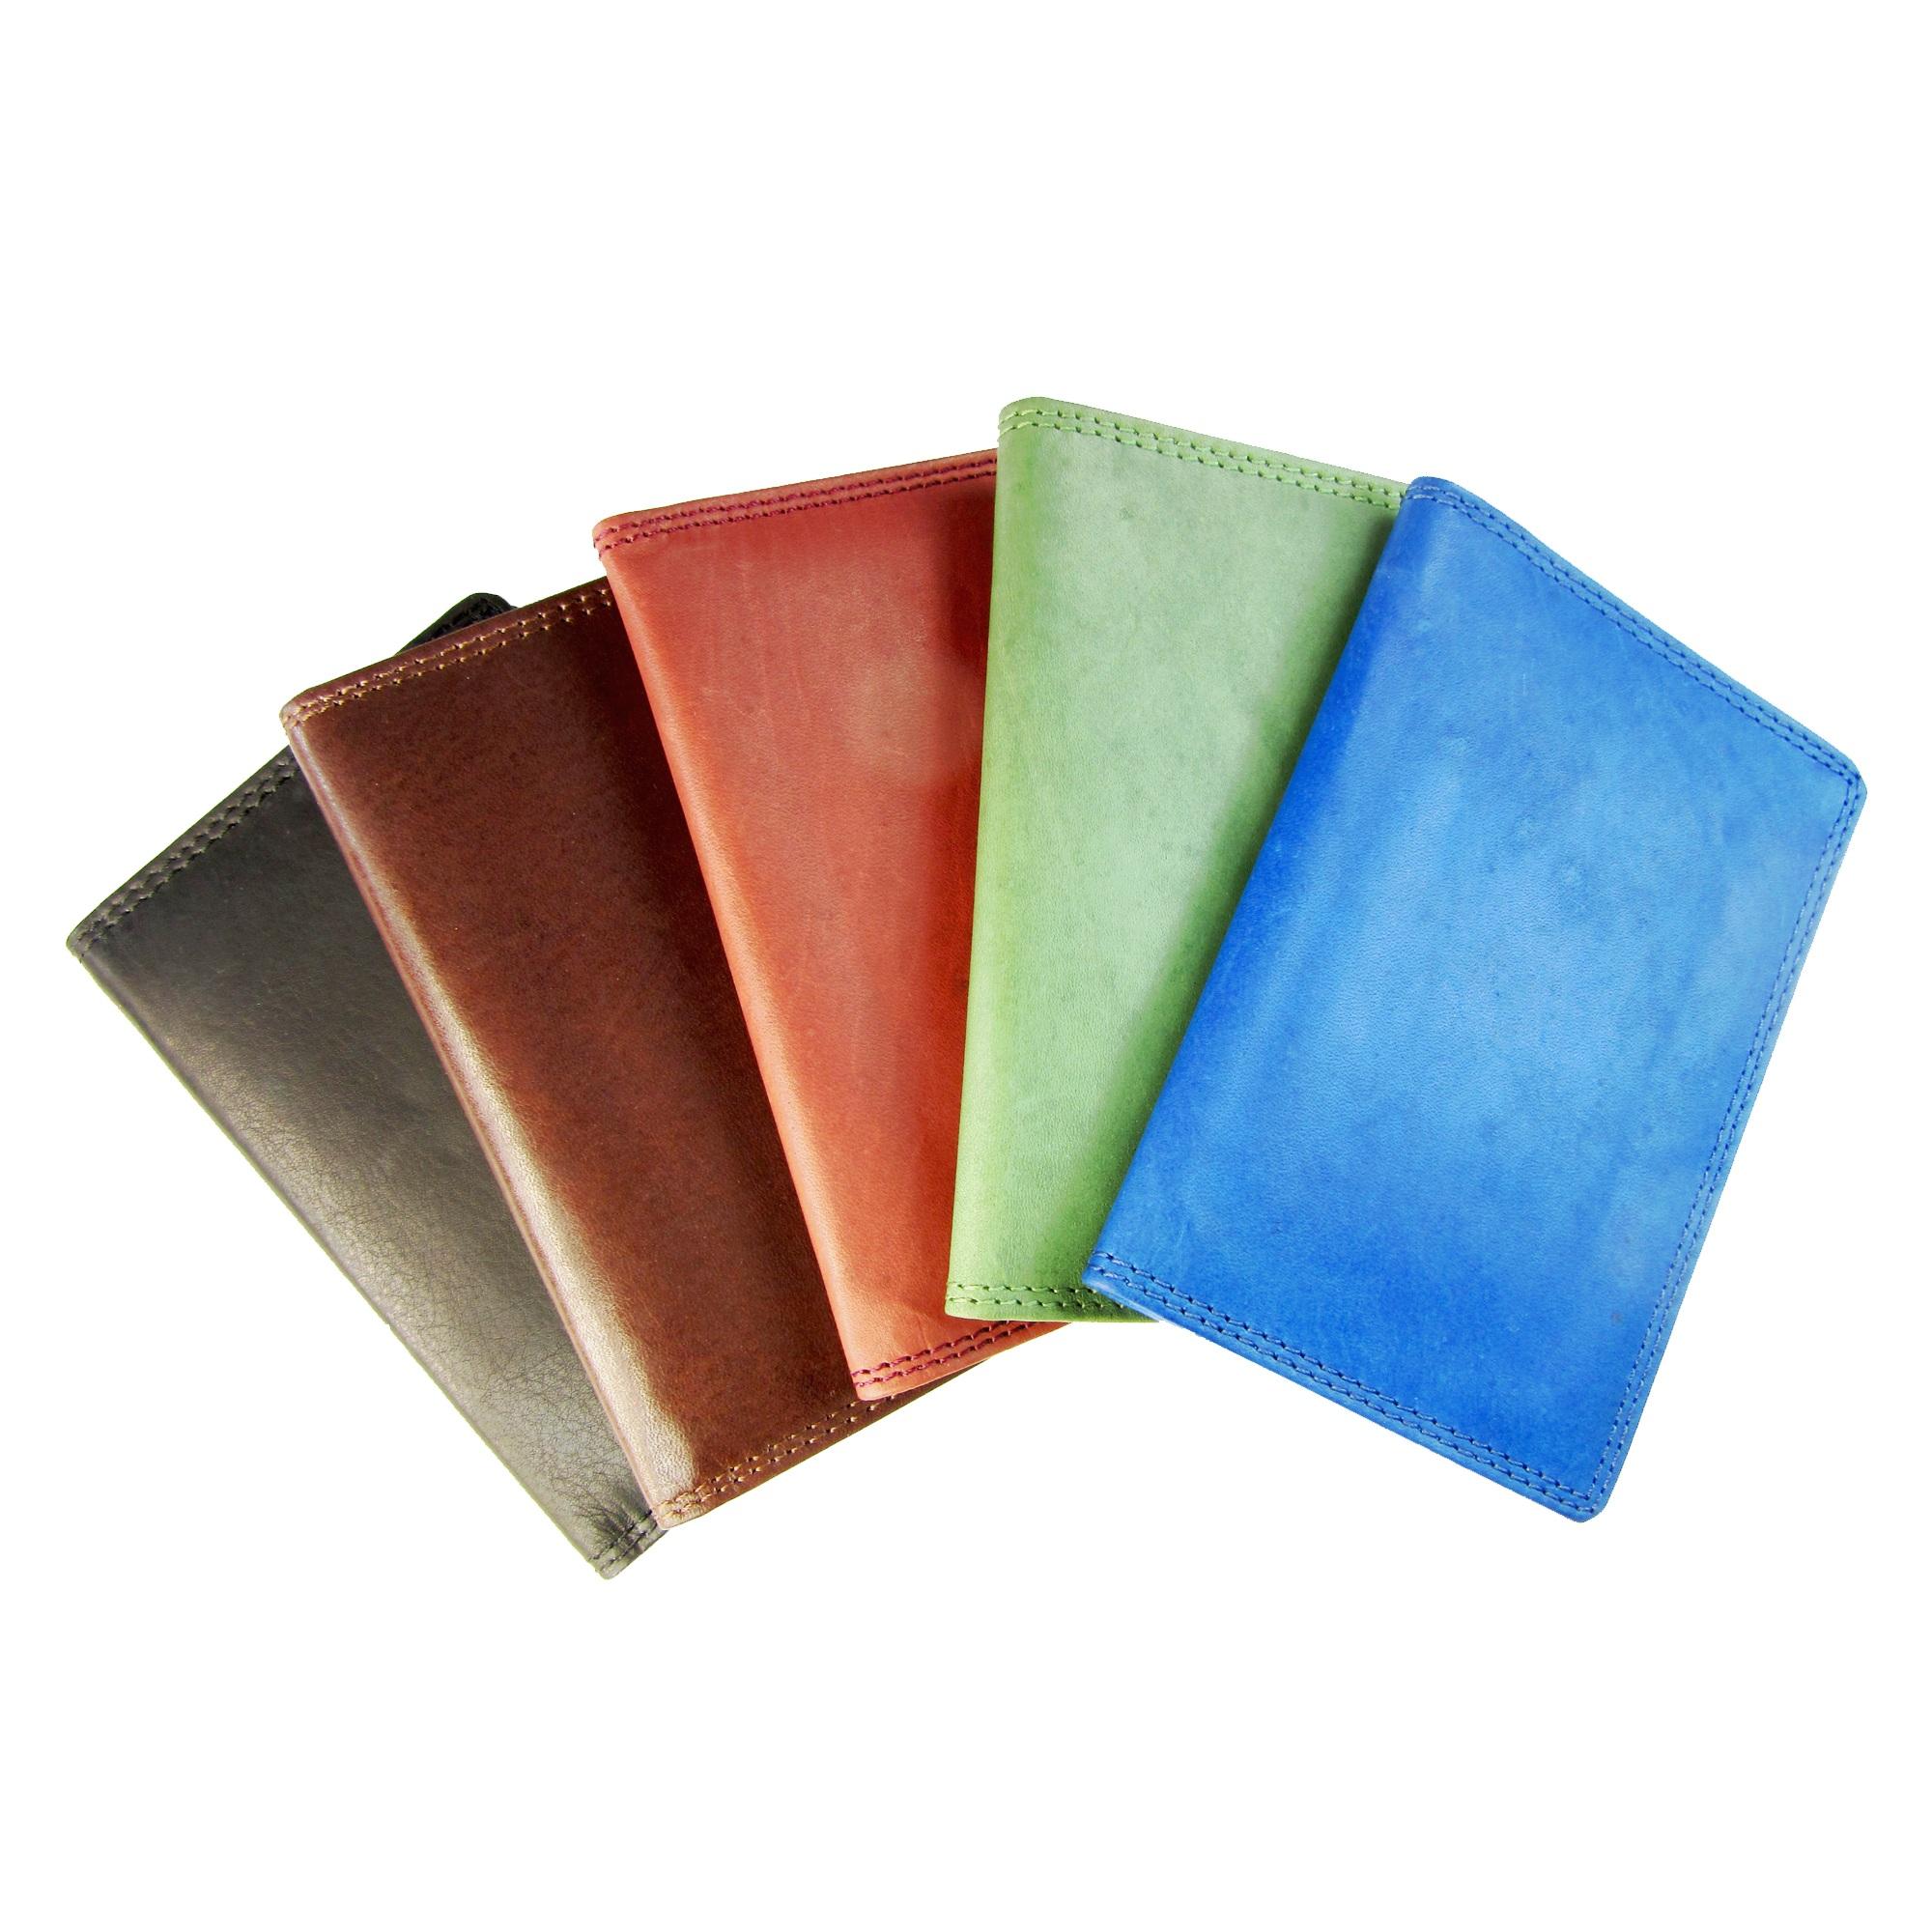 Free Images Material Leather Case Visitenkartenetui